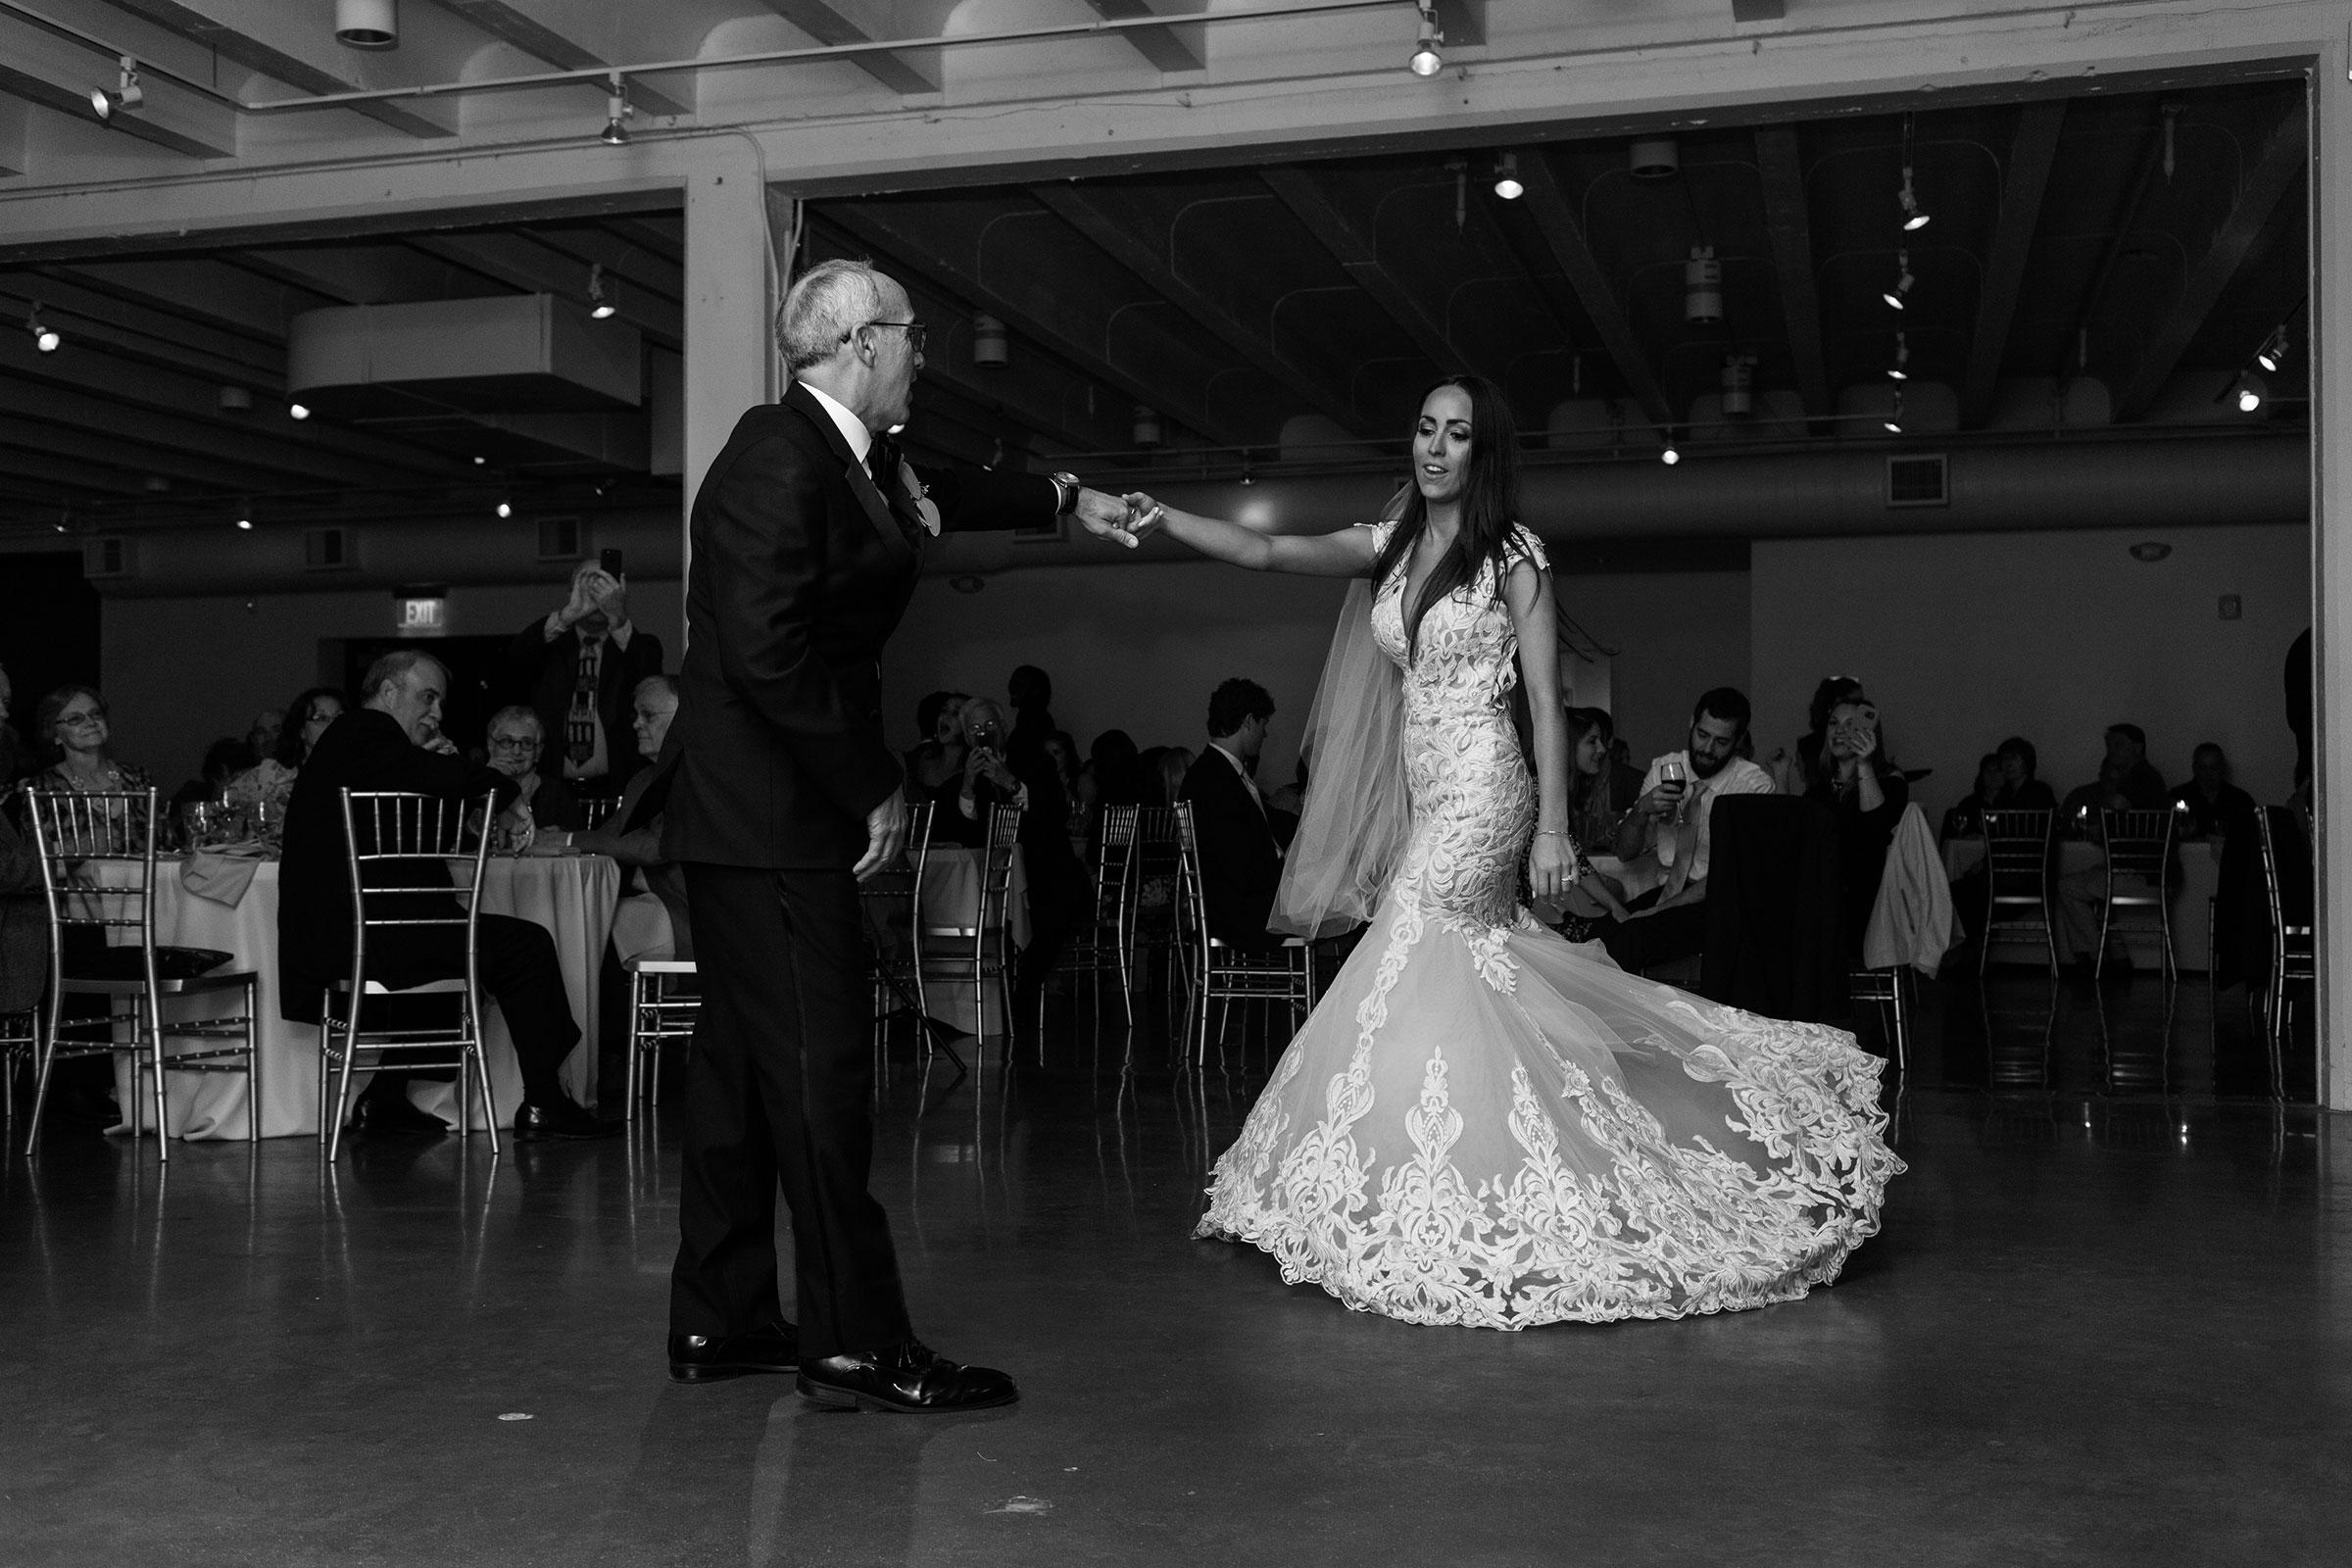 father-daughter-dance-spinning-bride-founders-one-nine-omaha-nebraska-raelyn-ramey-photography.jpg